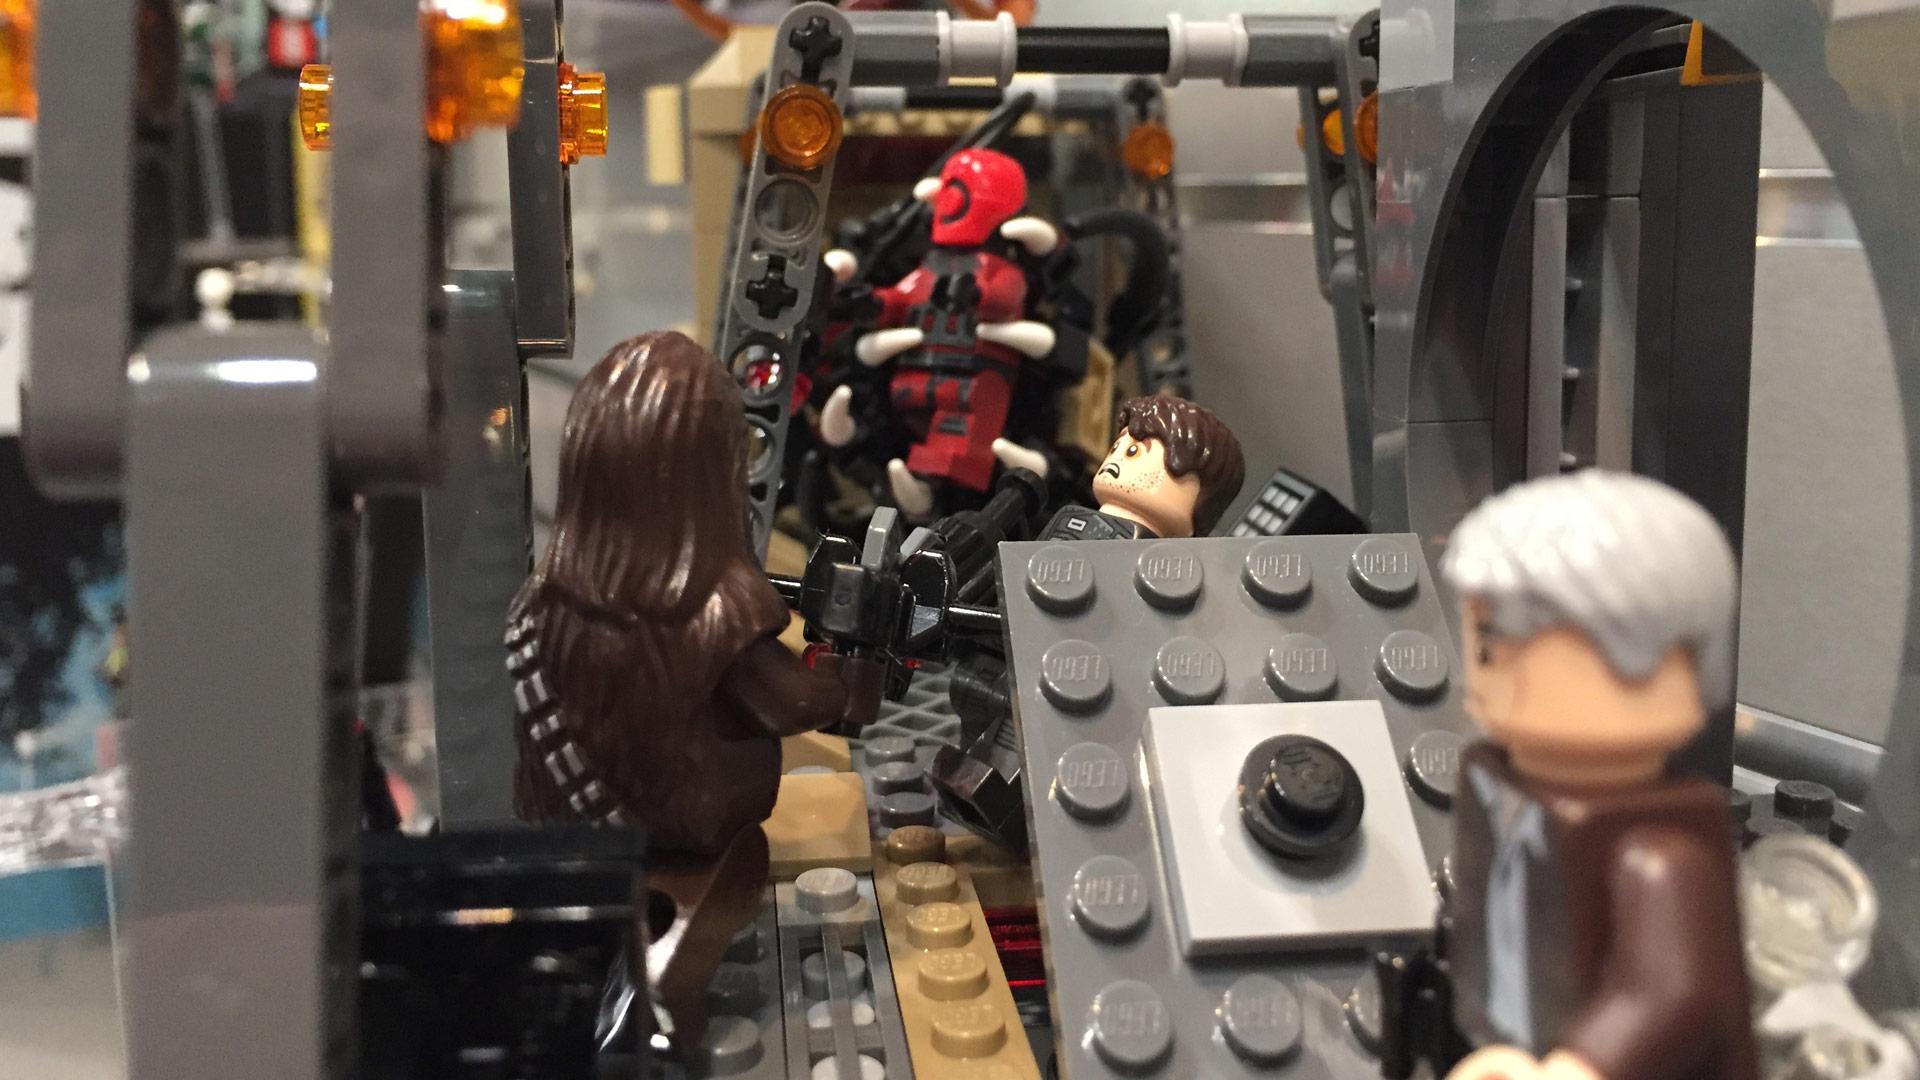 LEGO Star Wars Set 75180 Rathar Escape at Toy Fair 2017